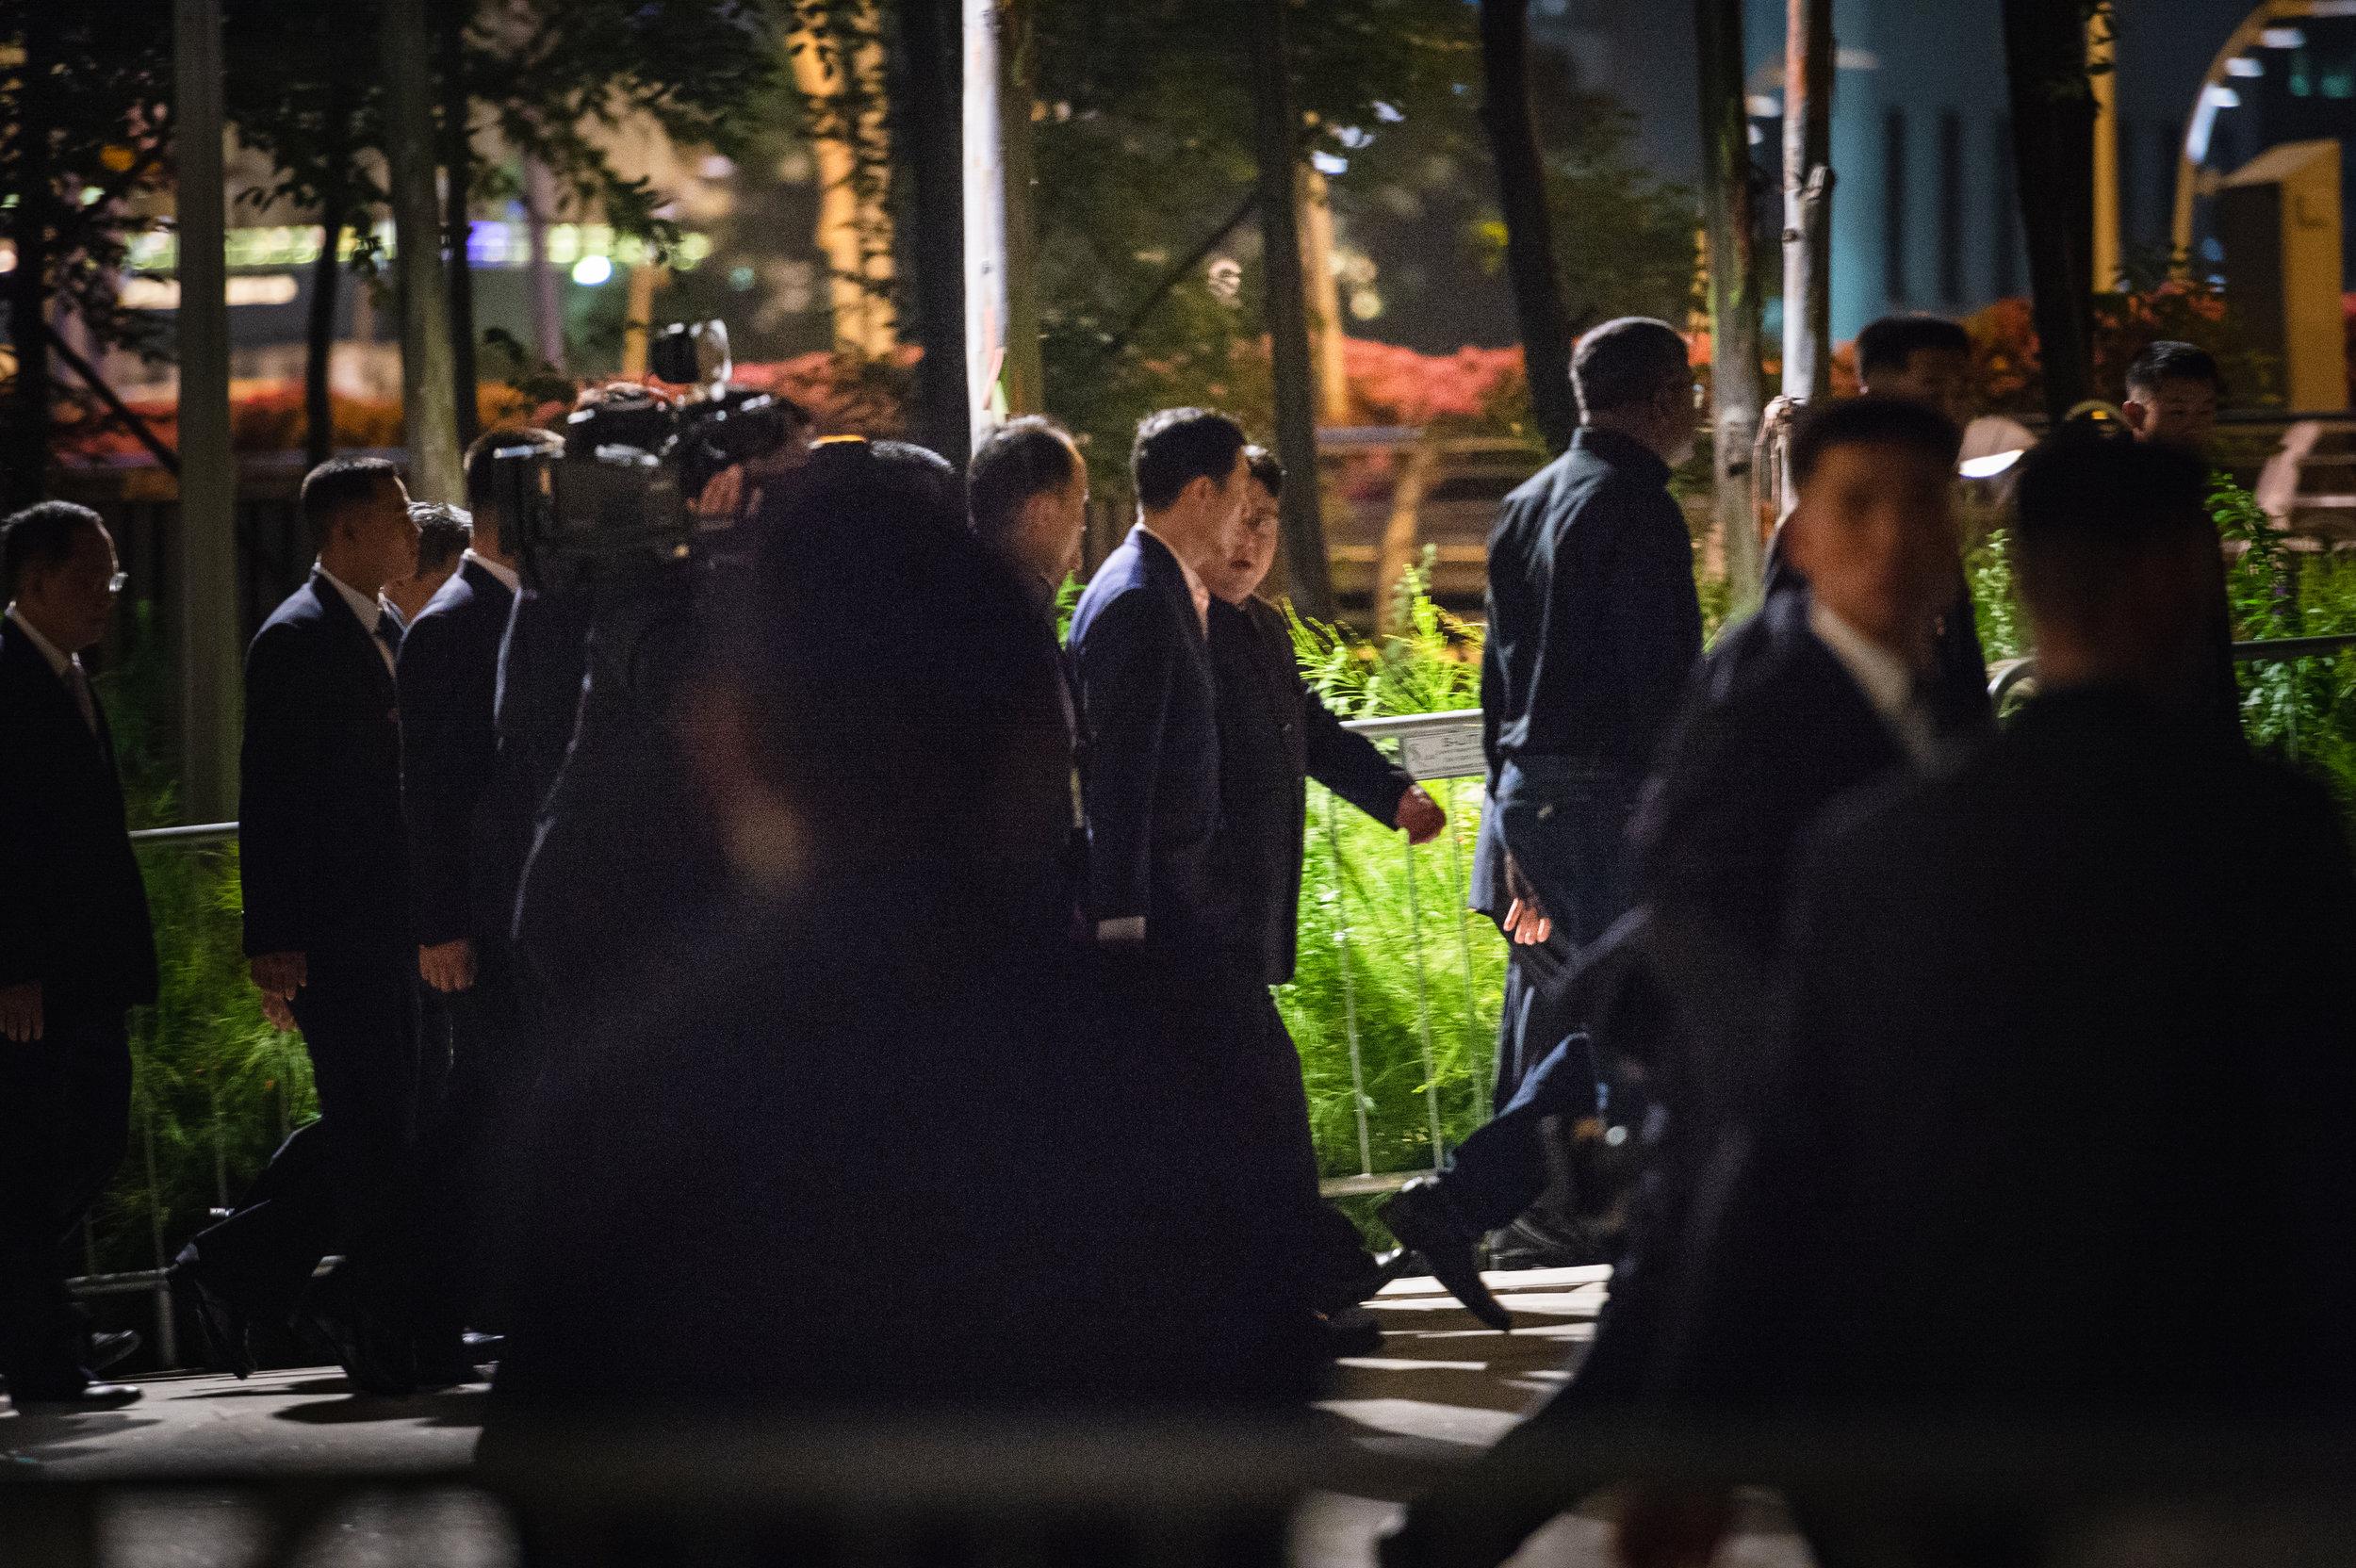 2018-06-11 - The Coincidental Kim Jong Un Esplanade Visit (7 of 11).jpg